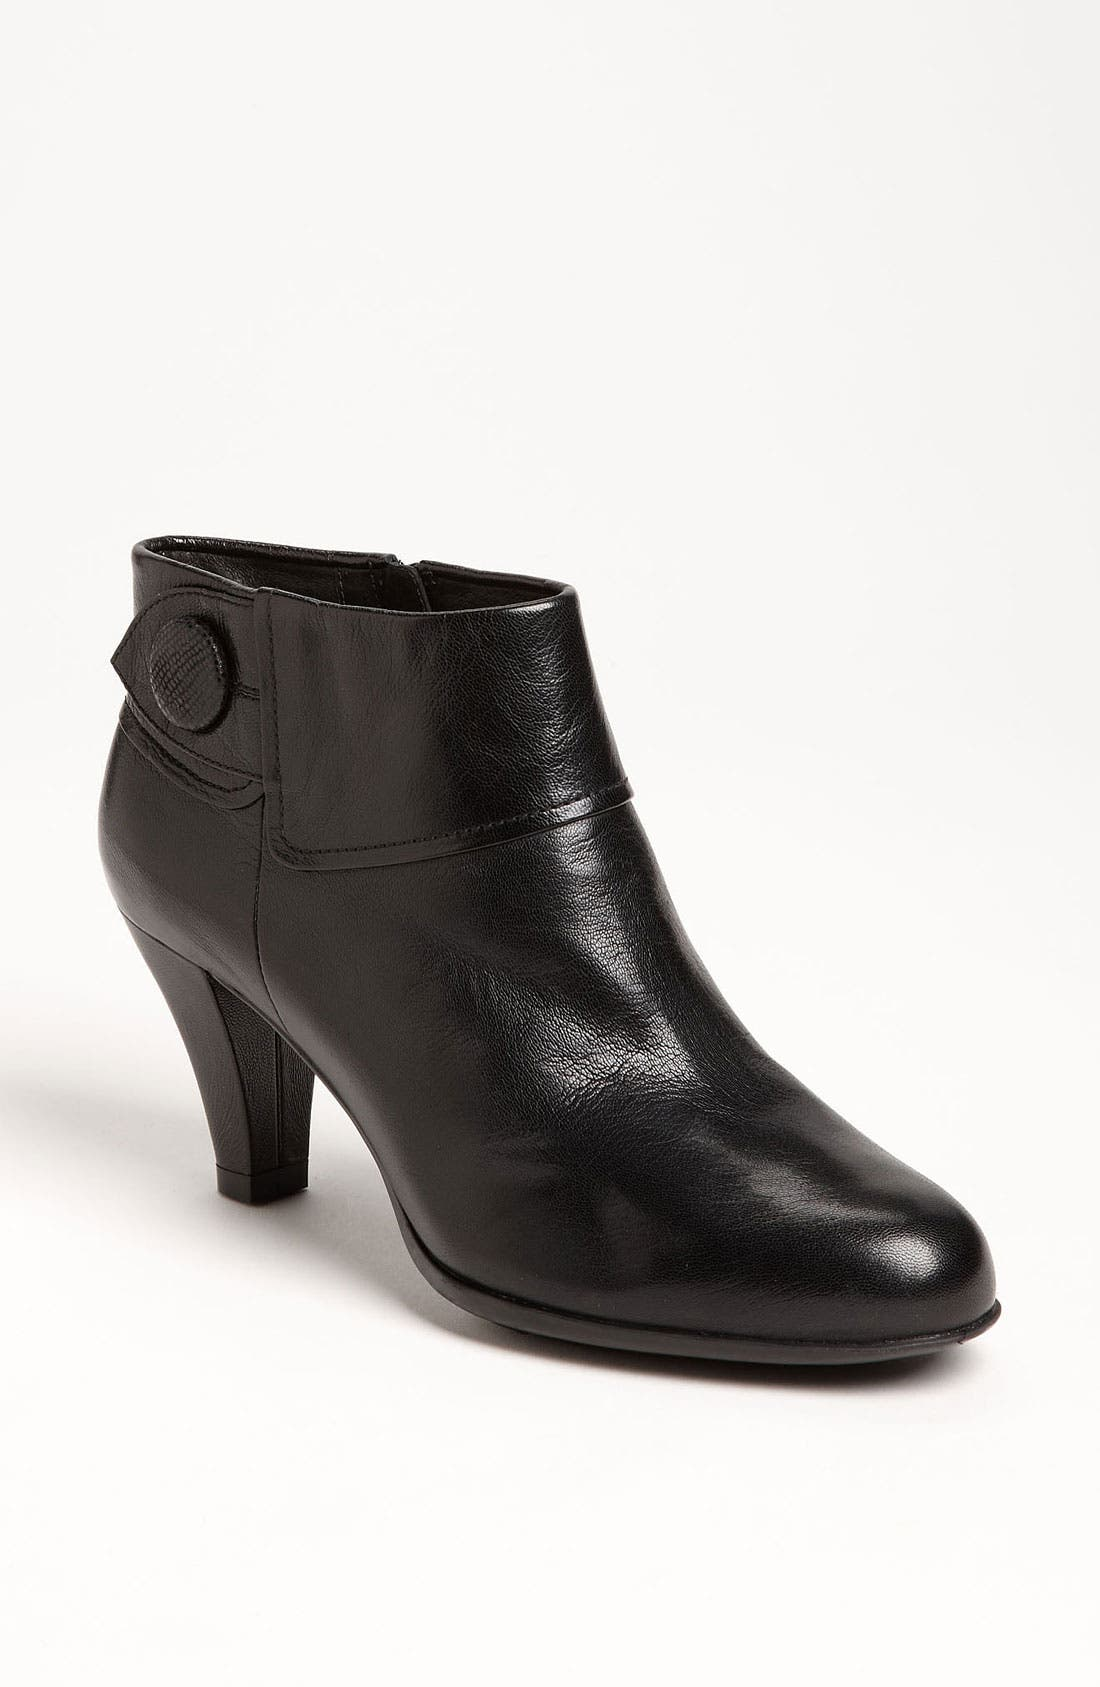 Alternate Image 1 Selected - Cobb Hill 'Tina' Boot